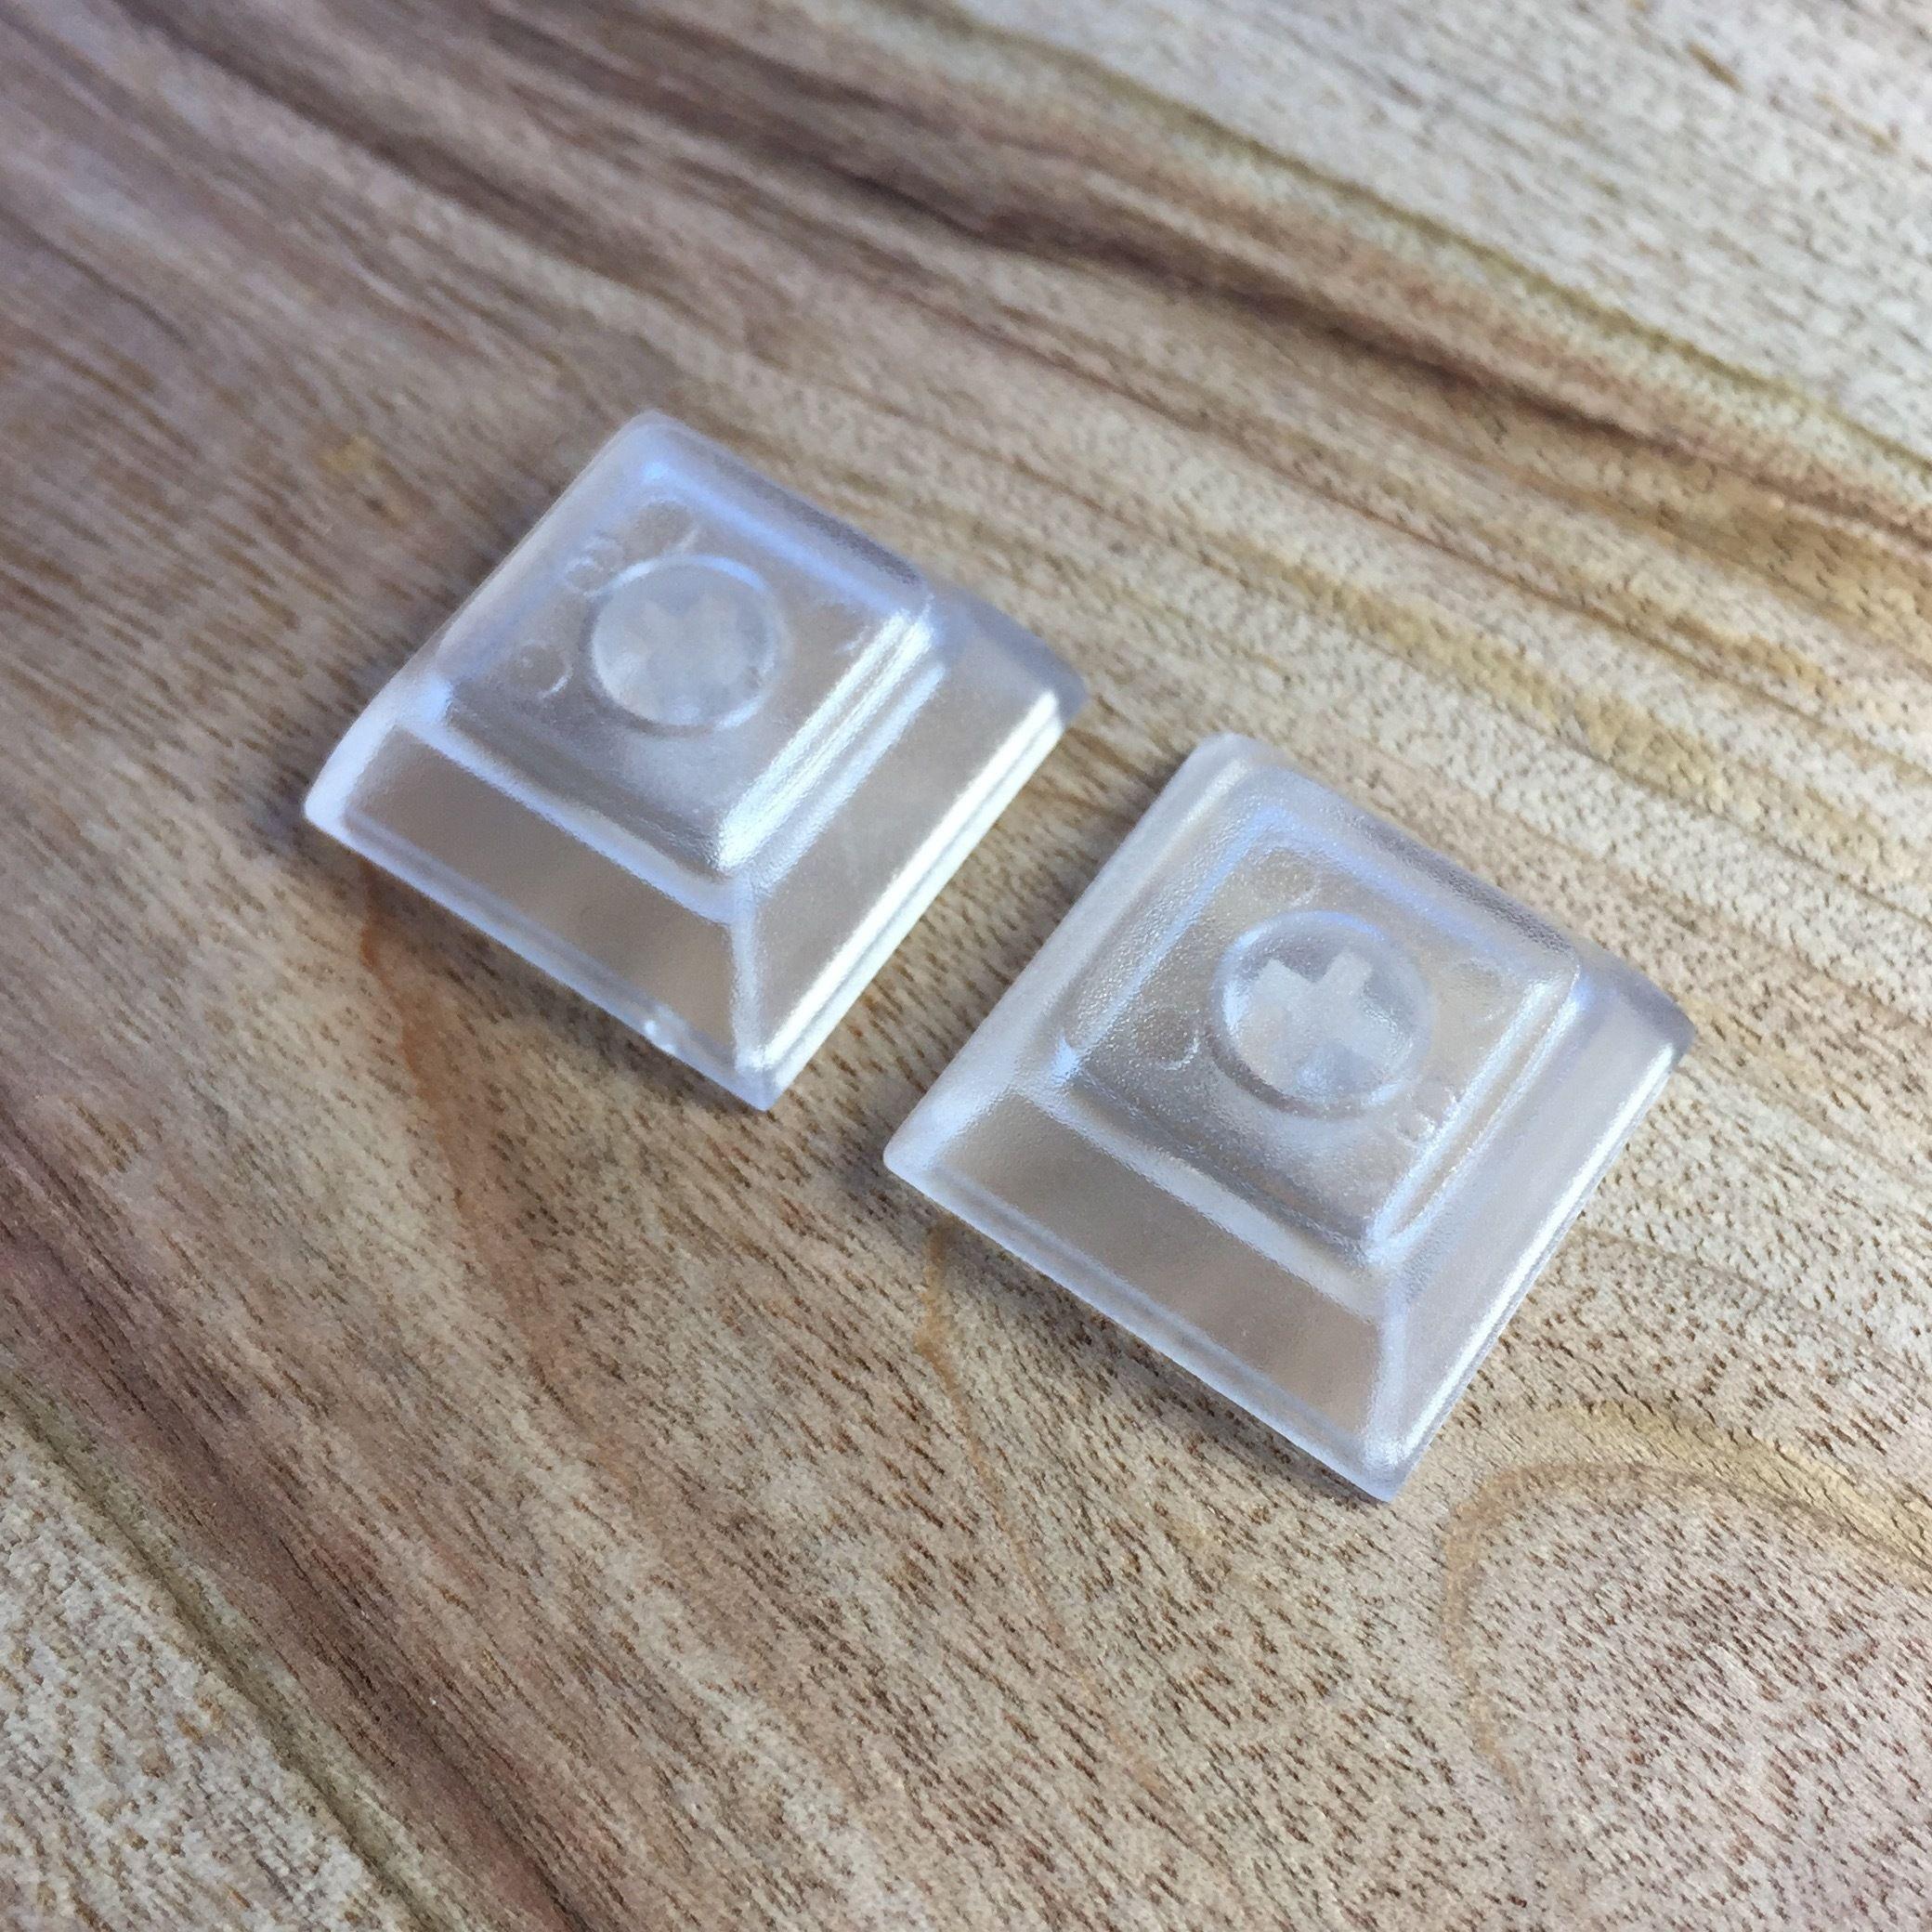 DSA ABS Keycap (2piece/Transparent)